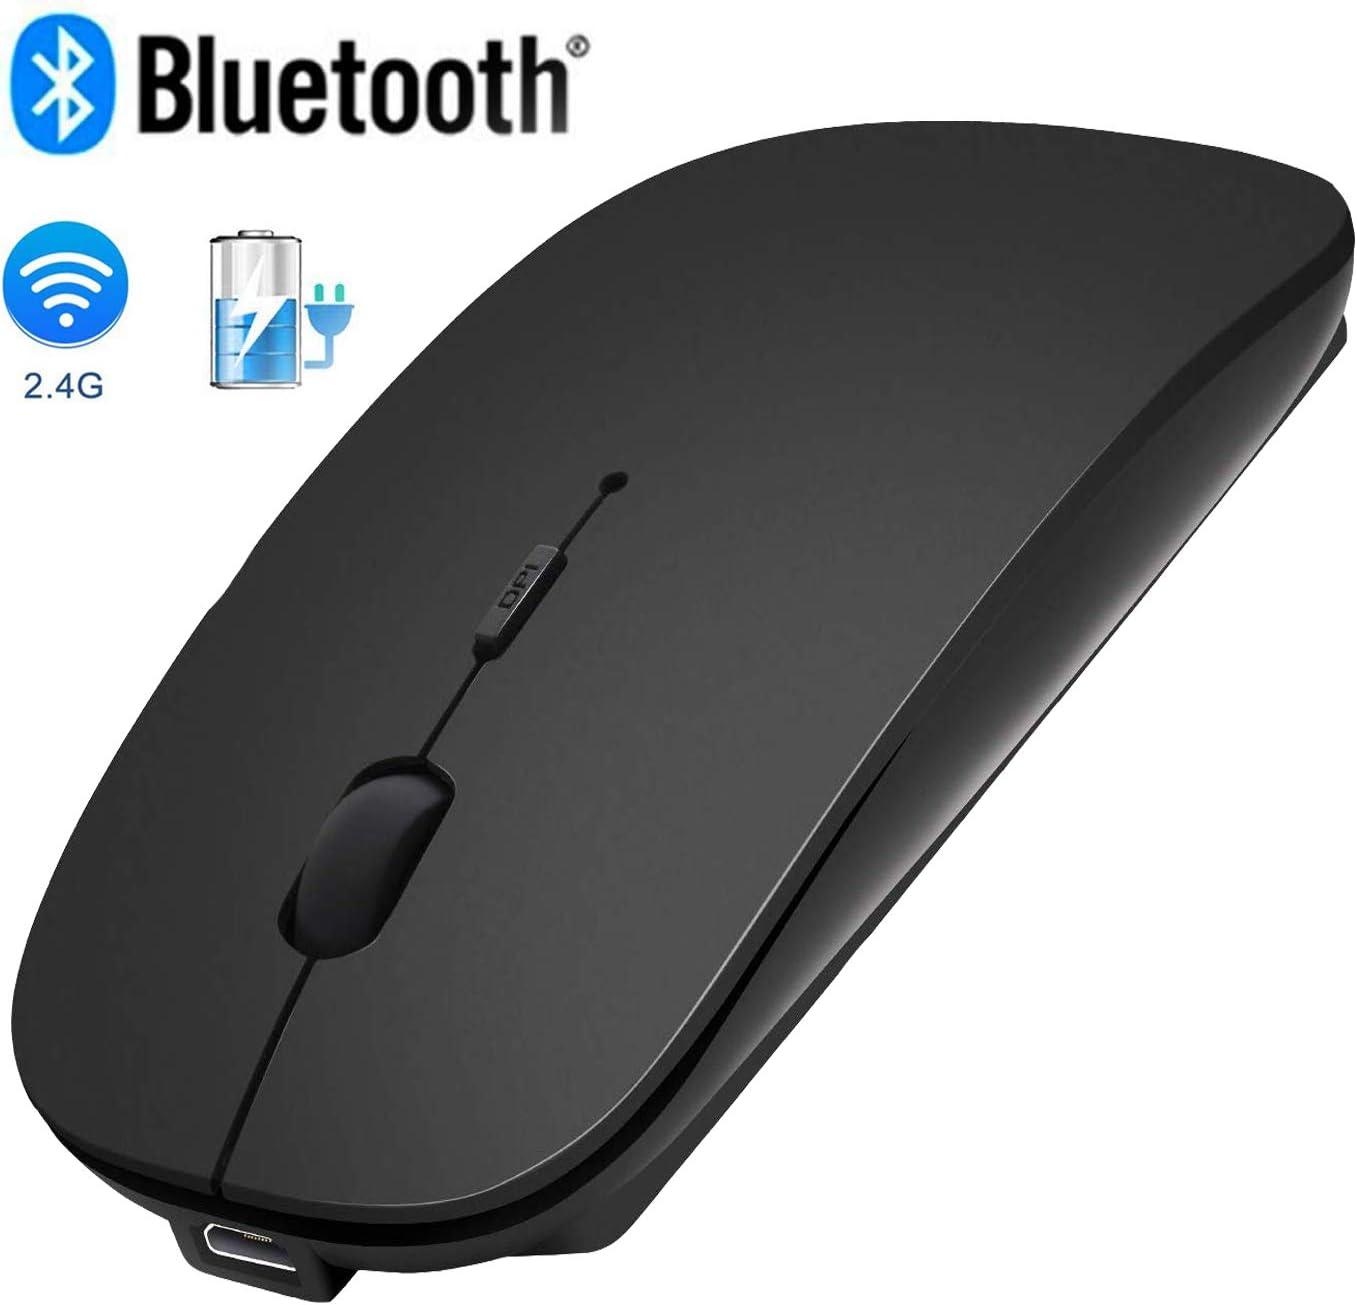 Ratón inalámbrico Bluetooth de 2,4 GHz 3 DPI ajustables-1MVS